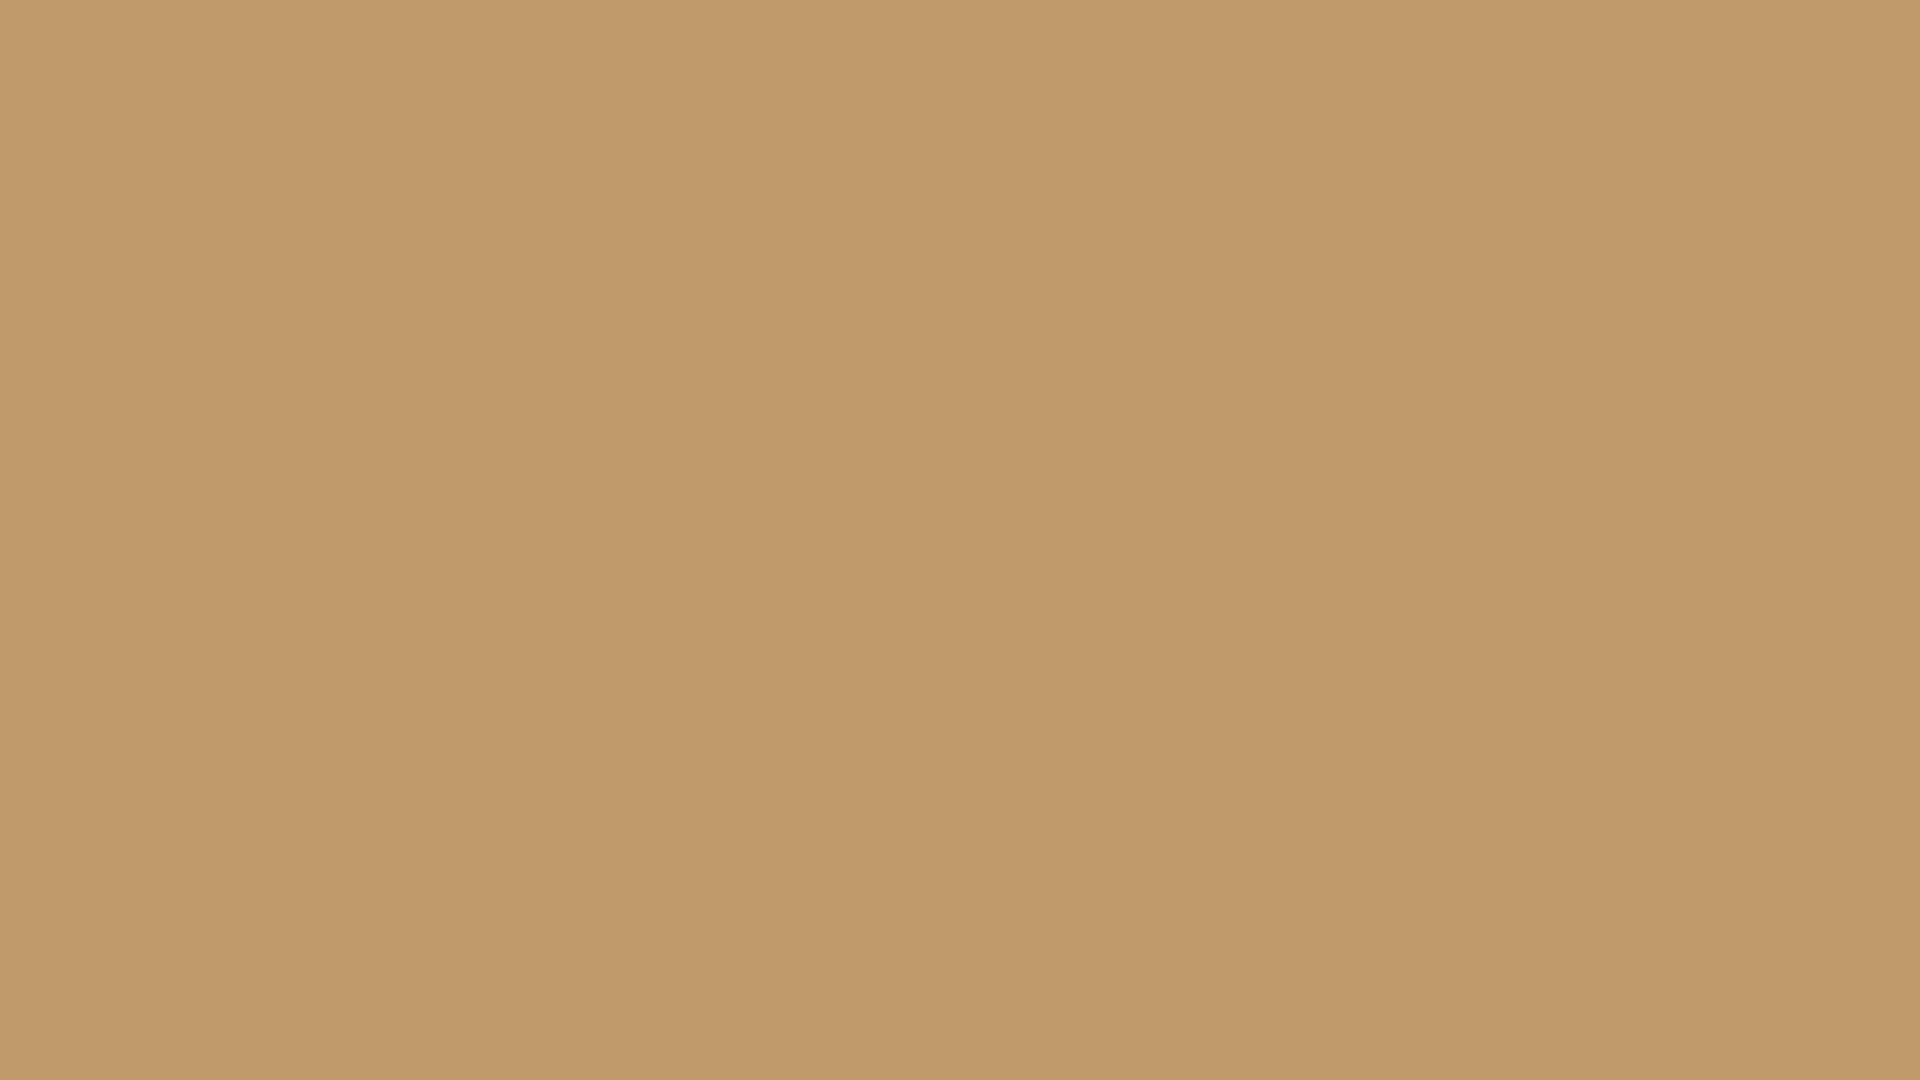 1920x1080 Camel Solid Color Background